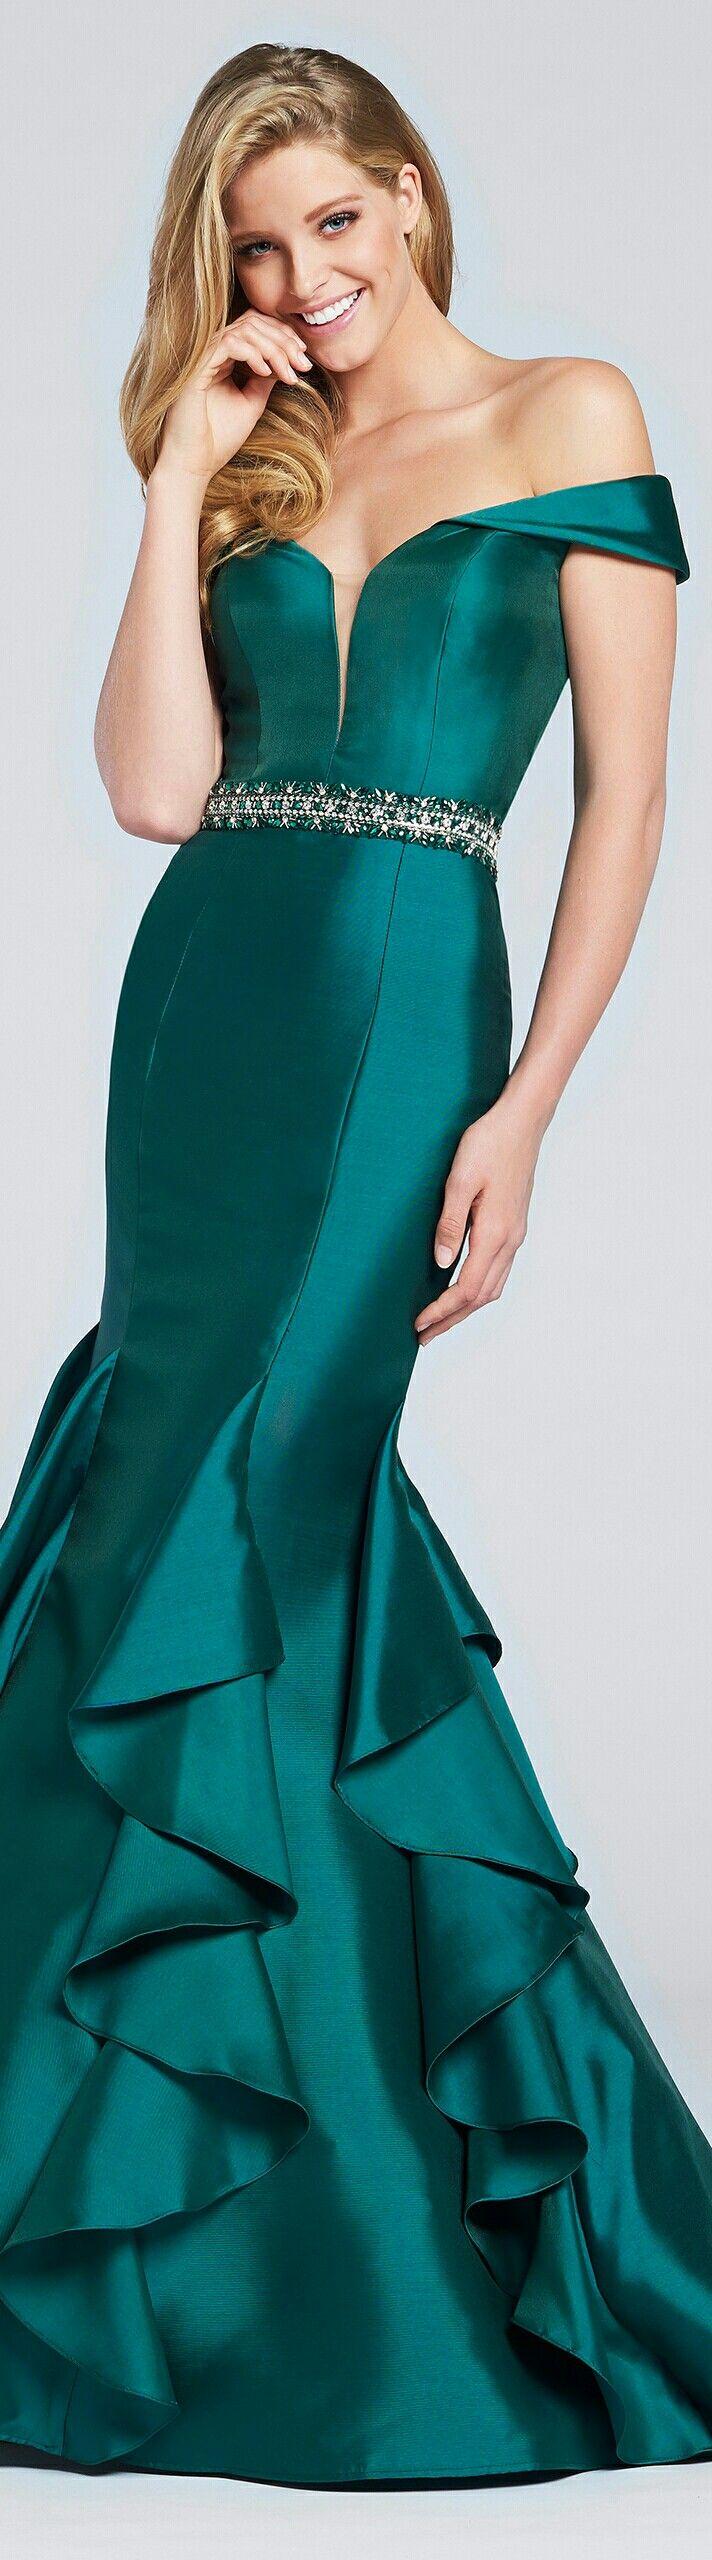 ELLIE WILDE ▪In Emerald Mermaid-Style Funnel Skirt w. Rib Ruffles at Calves and Beaded Waist Belt ▪#117034